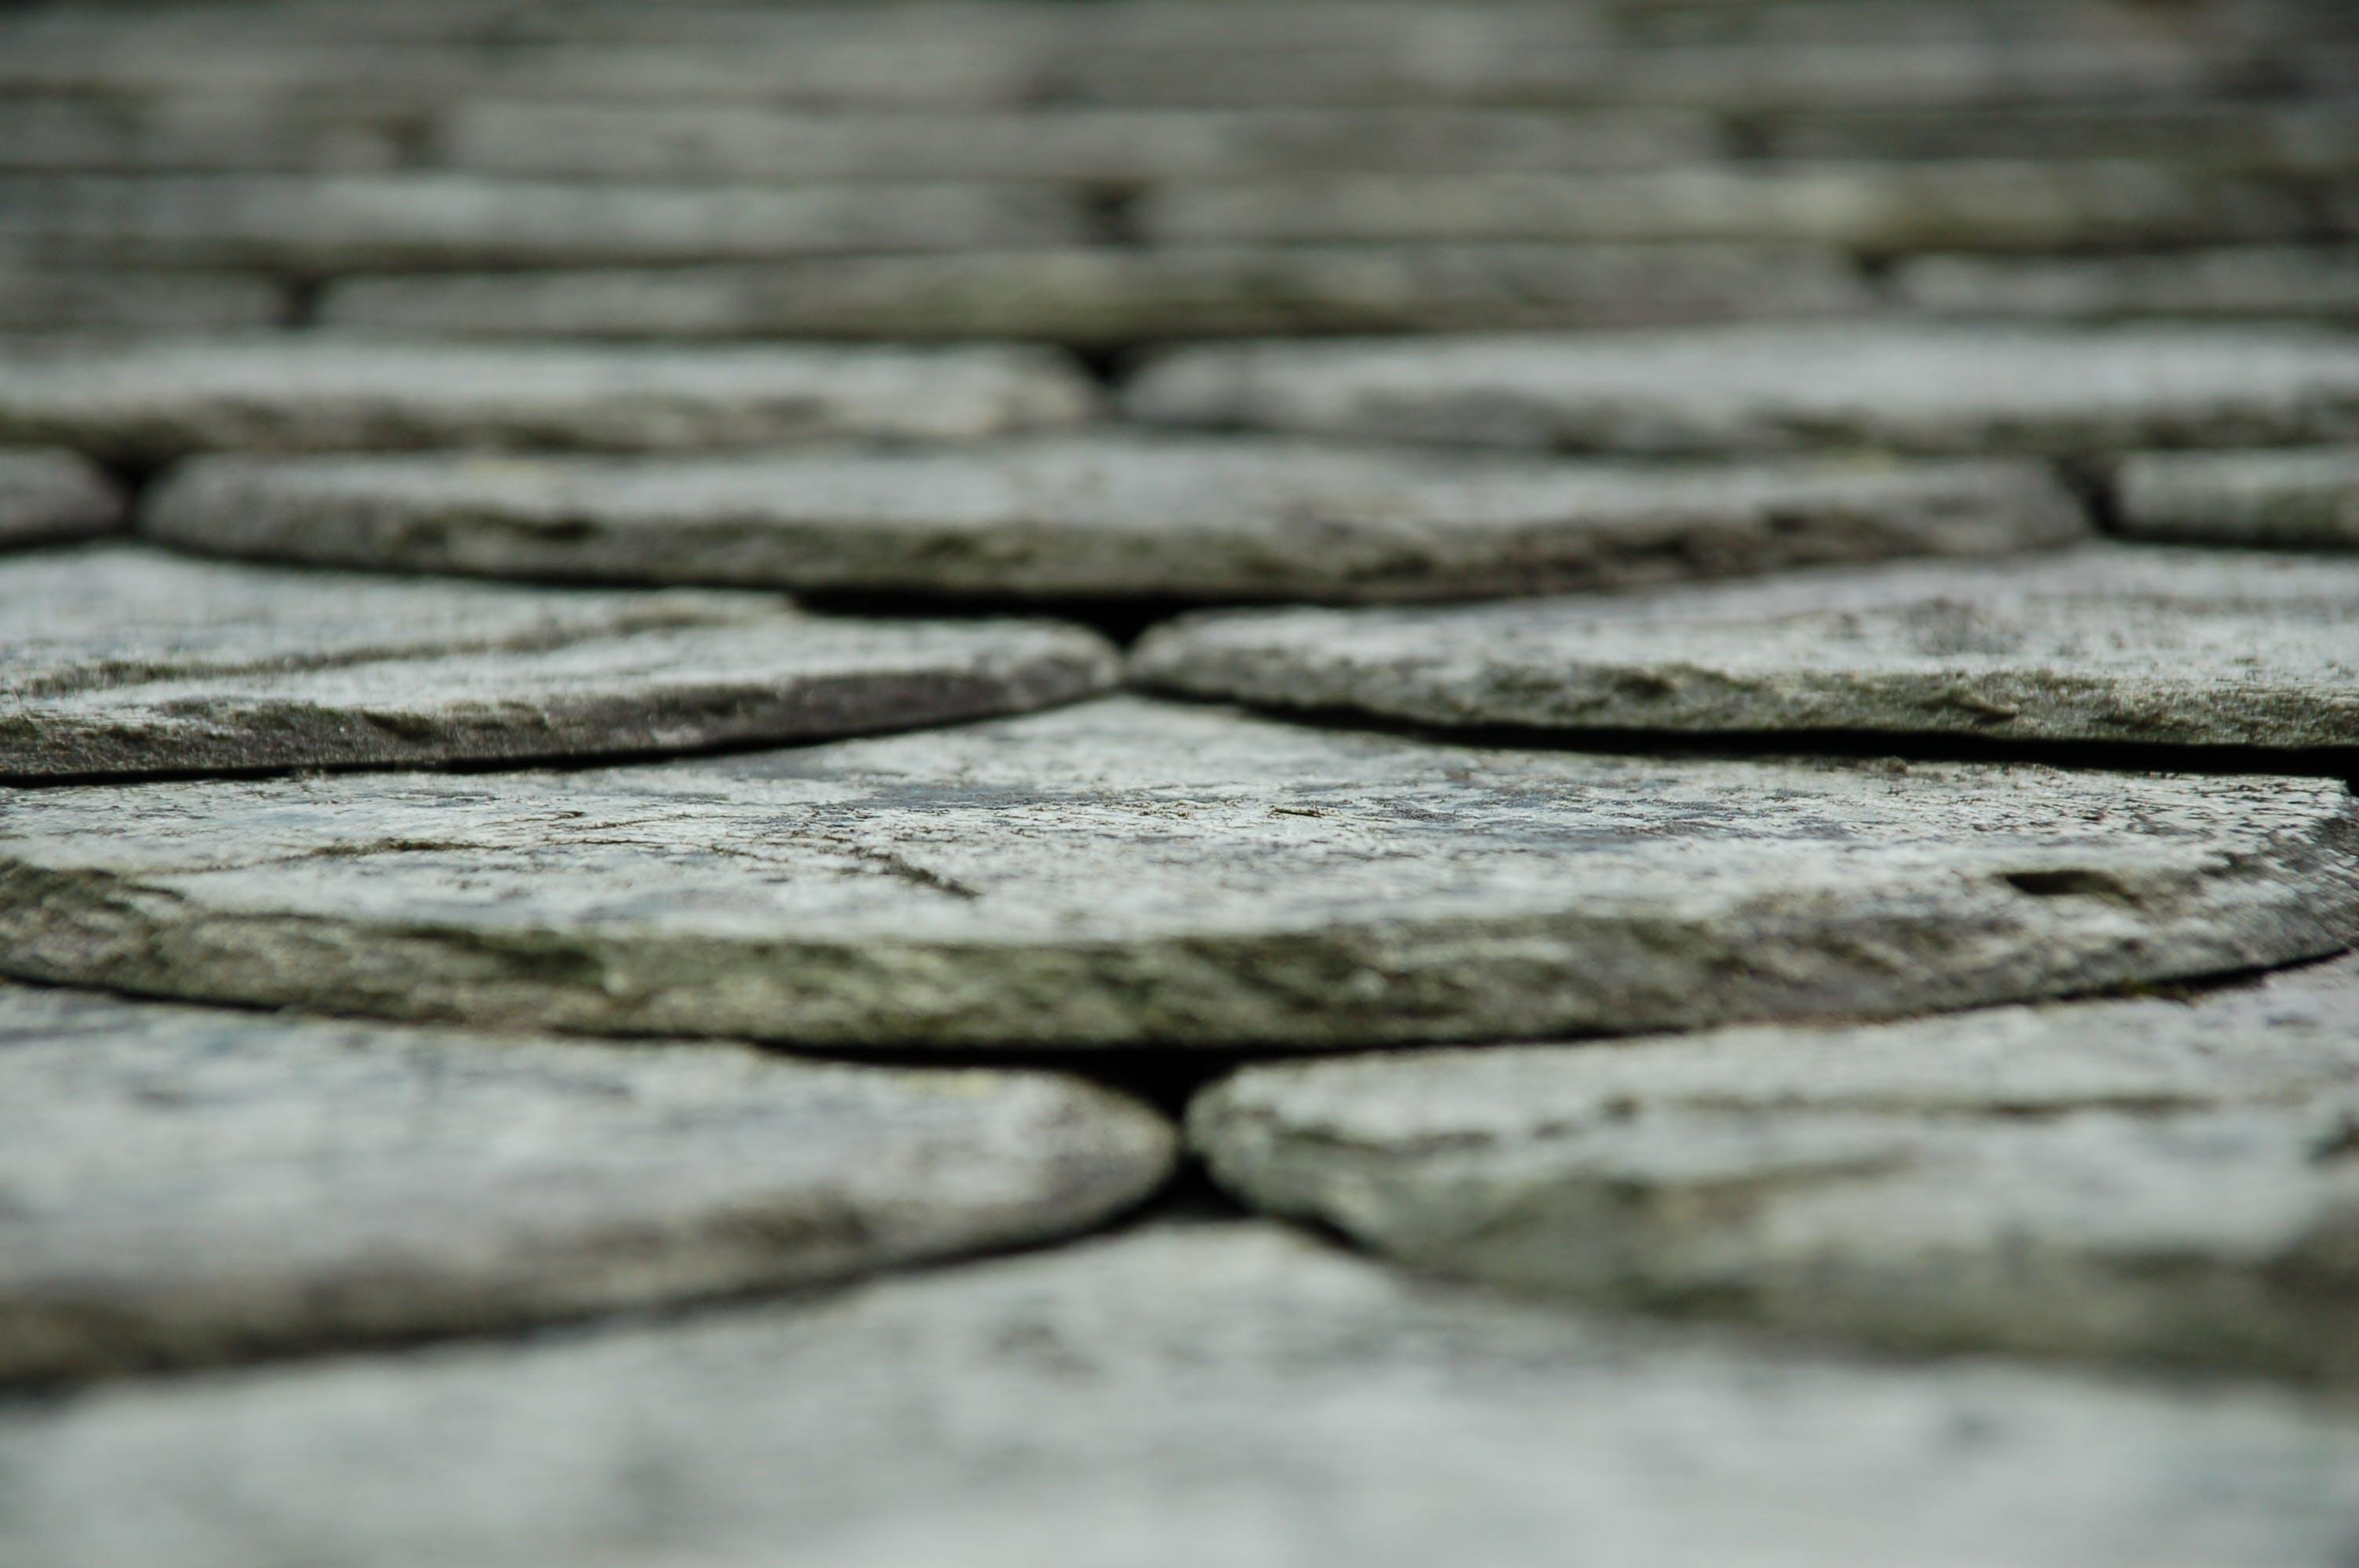 background, close-up, cobblestones